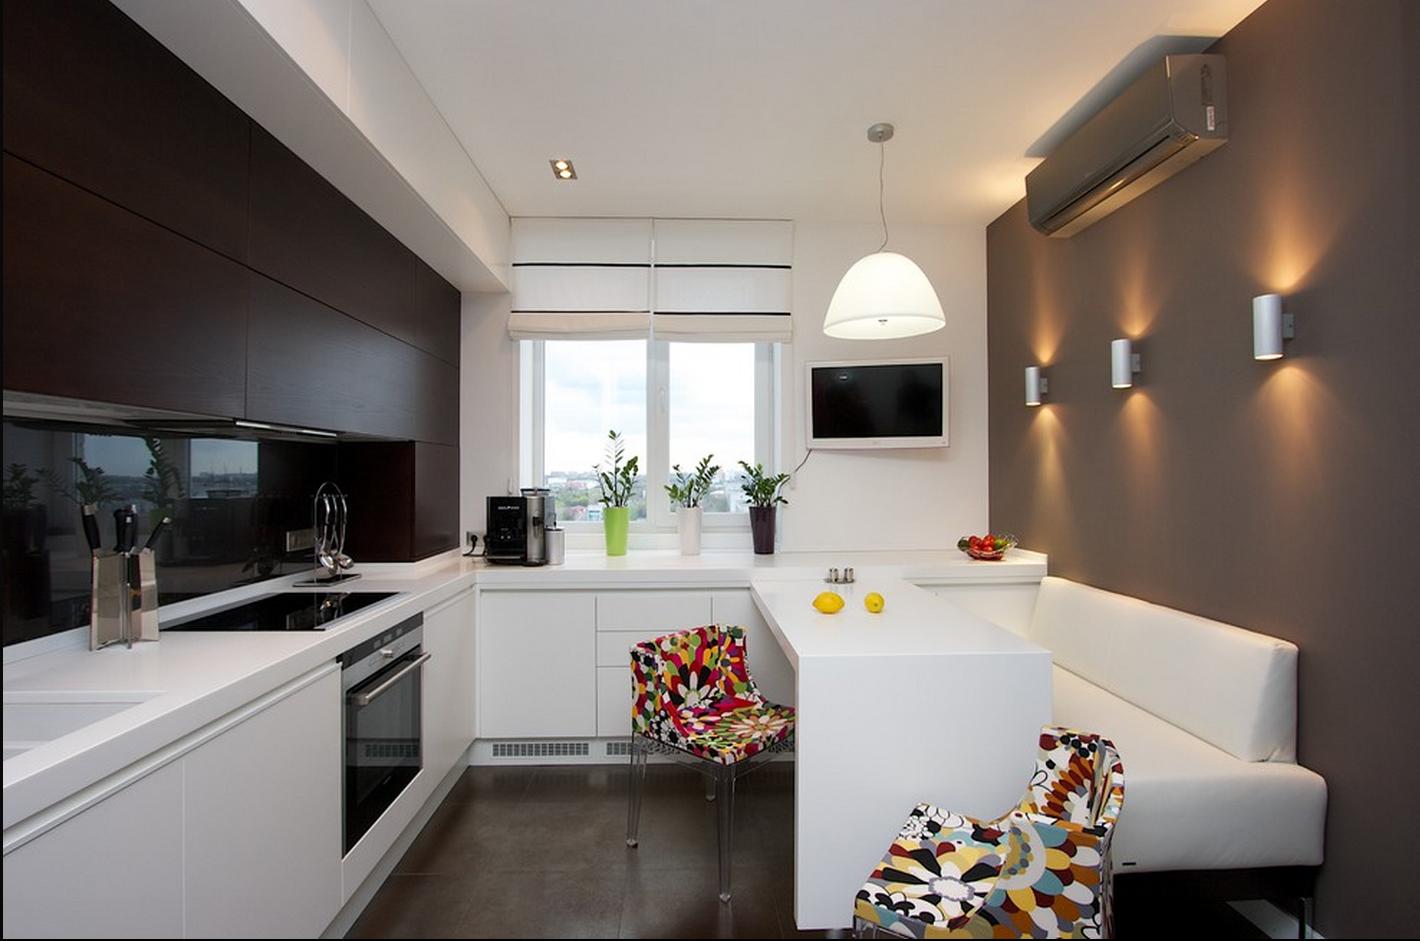 кухня 10 кв м с диваном фото декор